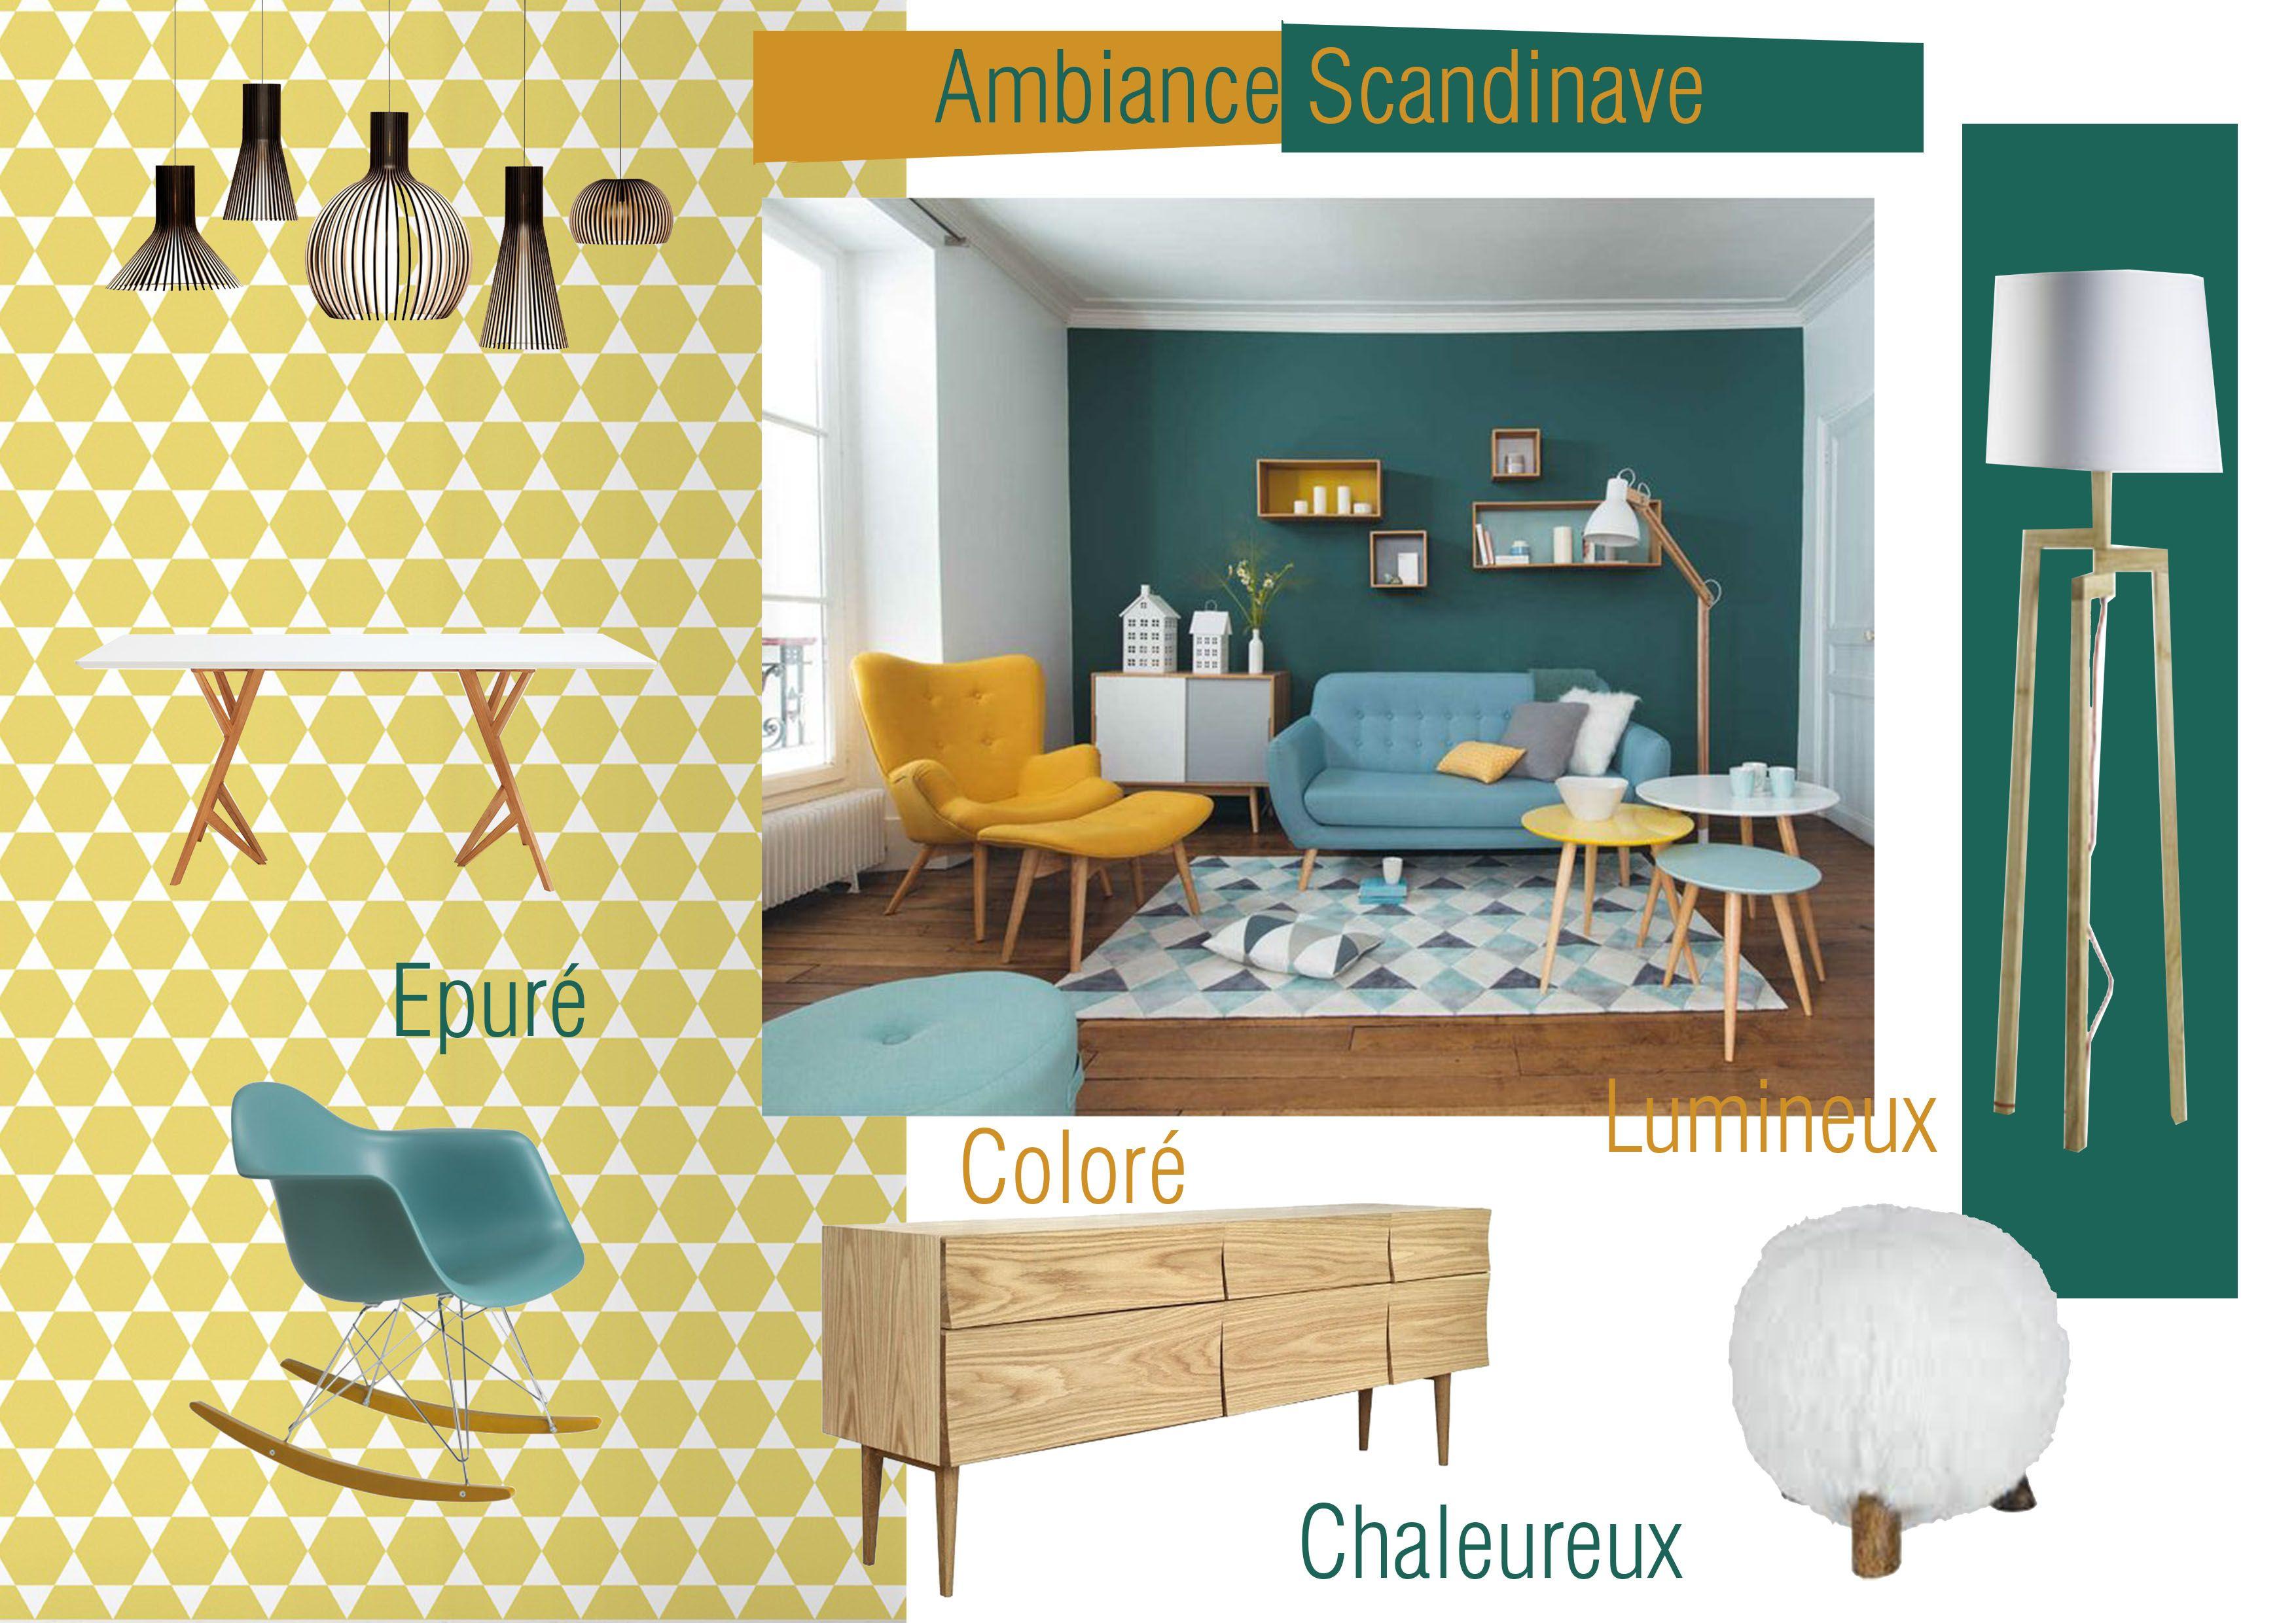 planche ambiance style scandinave d coration d 39 int rieur. Black Bedroom Furniture Sets. Home Design Ideas